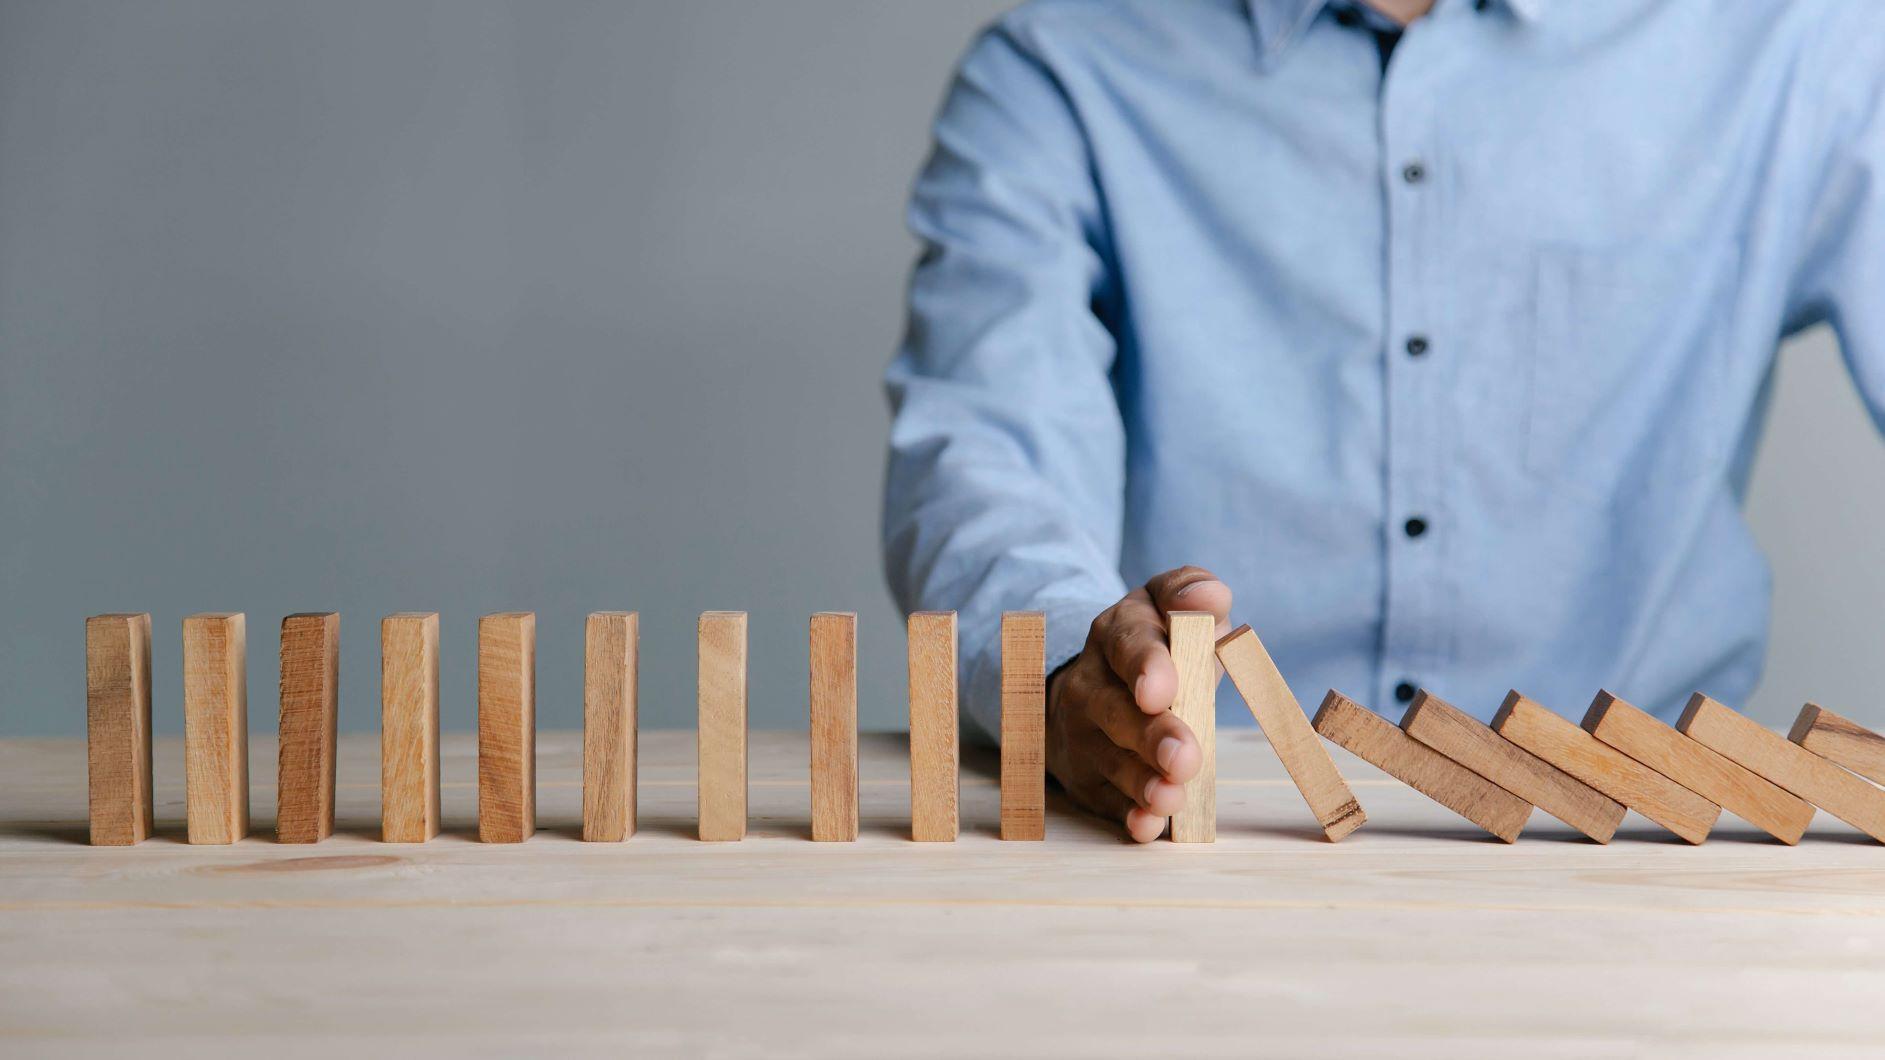 Correr riscos calculados comportamento empreendedor